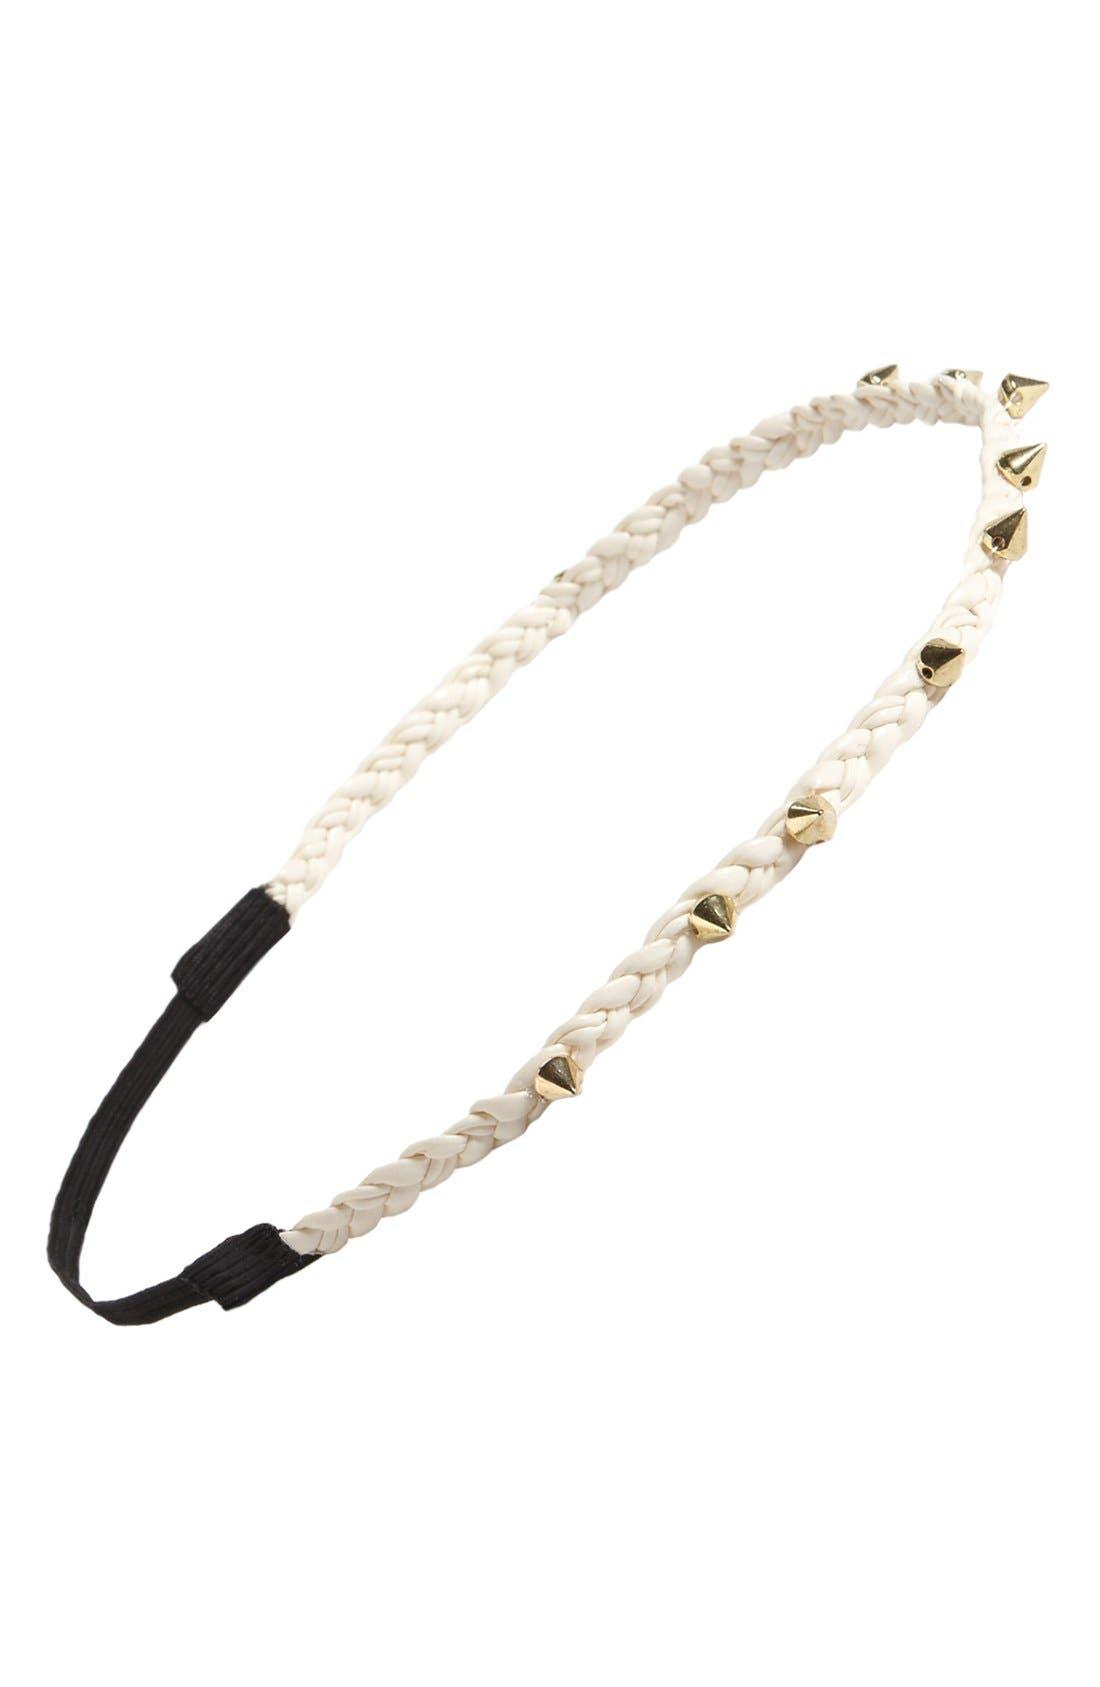 Alternate Image 1 Selected - Stephan & Co. Studded Rope Braid Headband